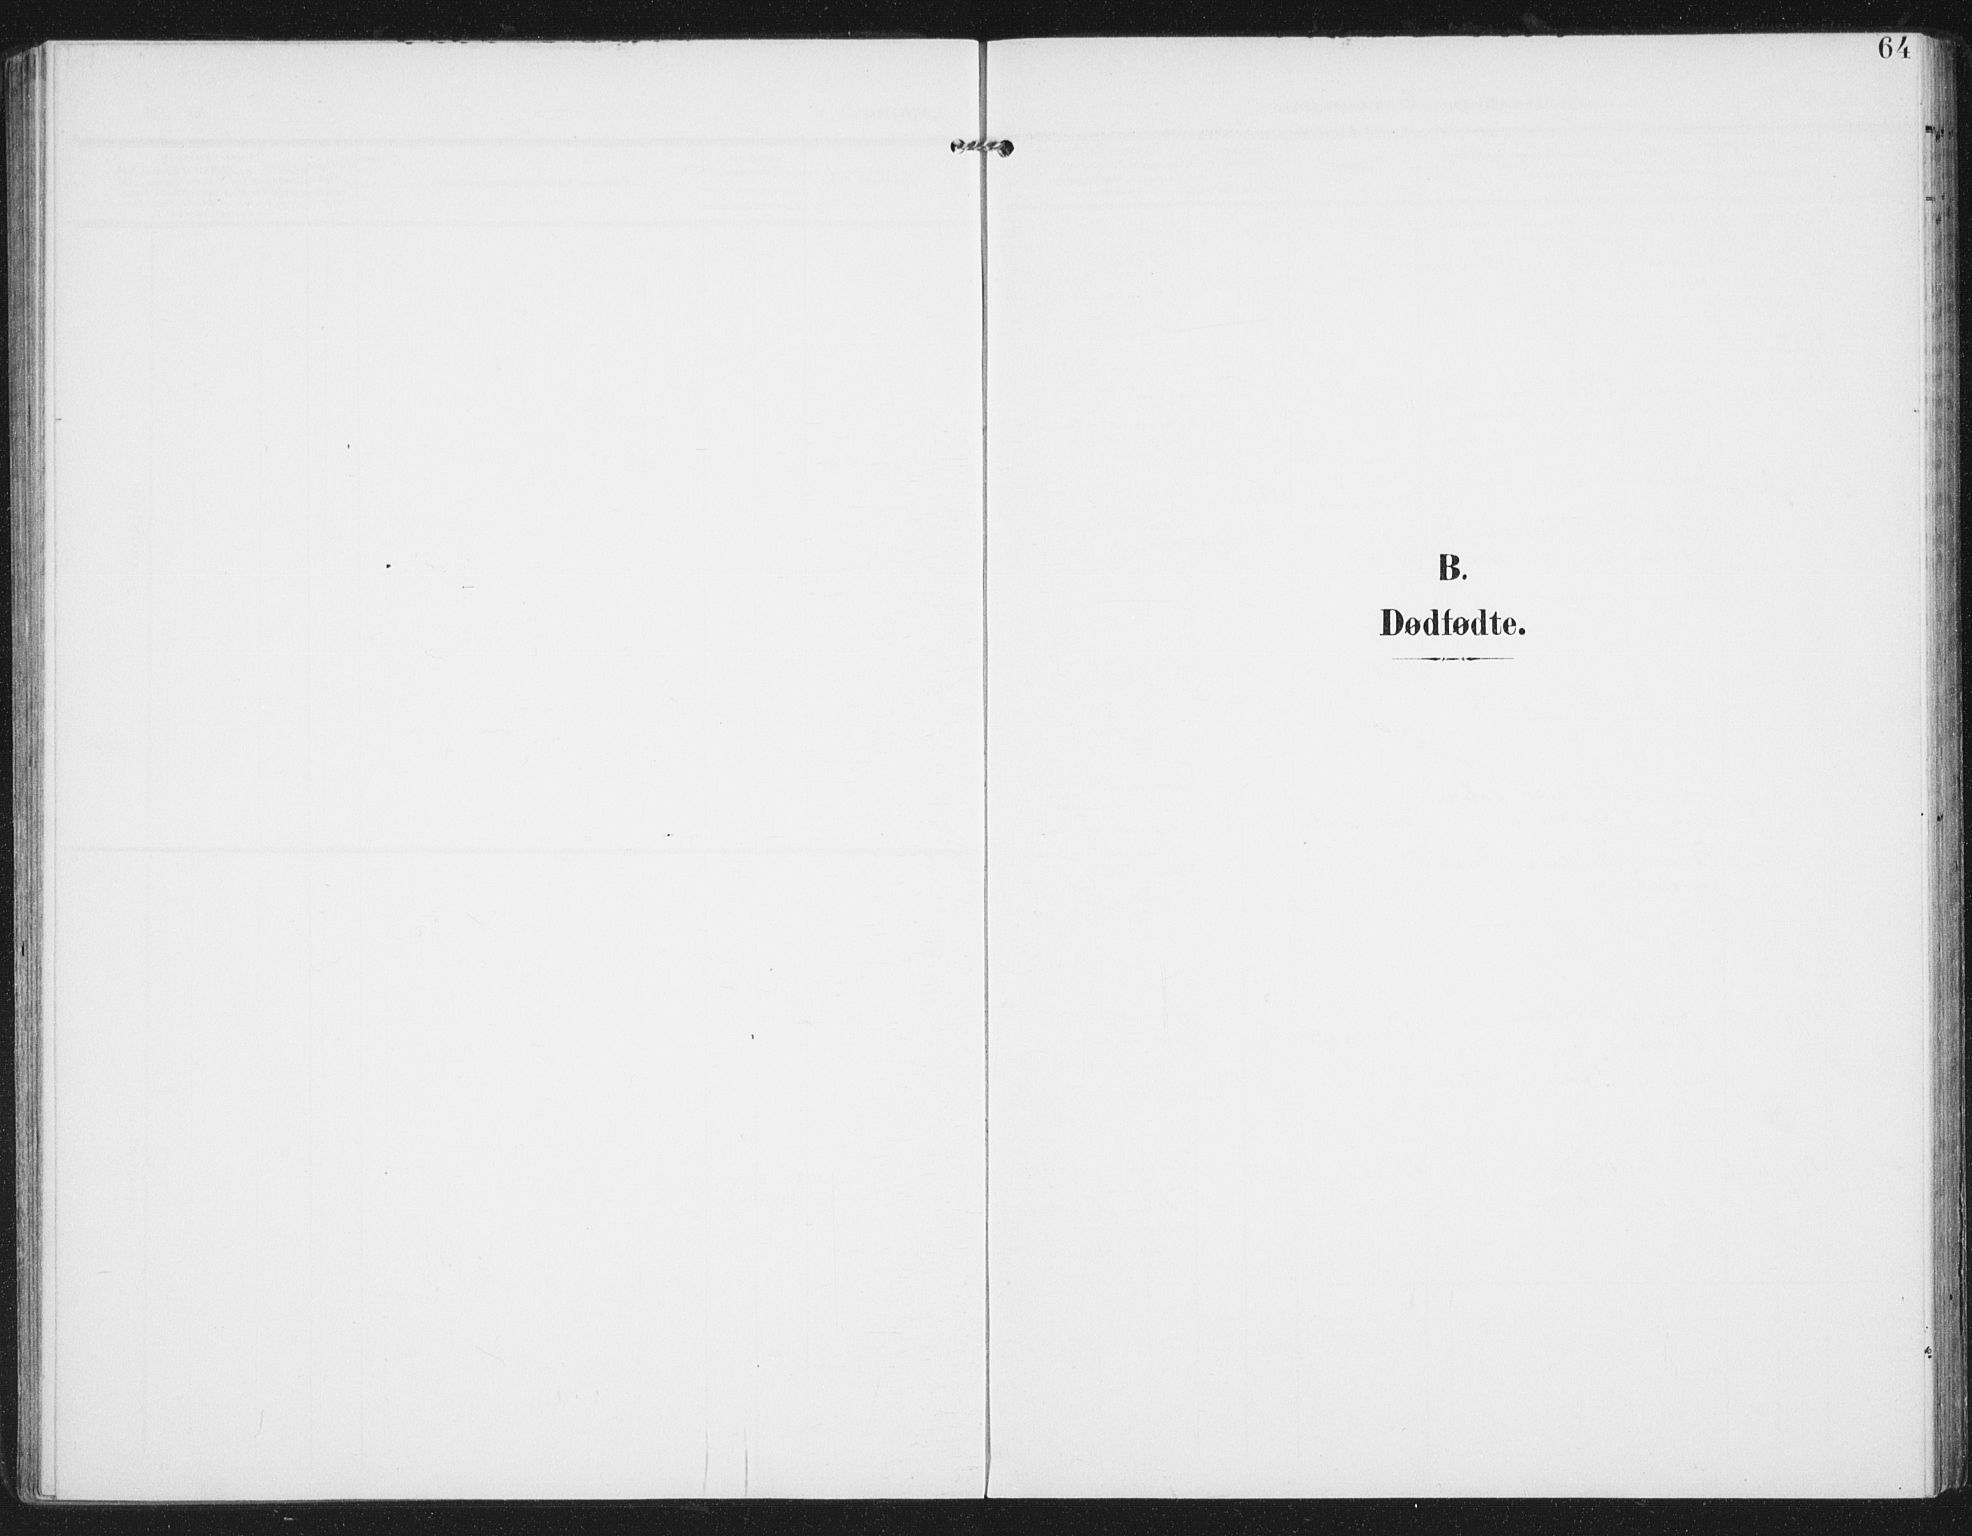 SAT, Ministerialprotokoller, klokkerbøker og fødselsregistre - Nordland, 886/L1221: Ministerialbok nr. 886A03, 1903-1913, s. 64